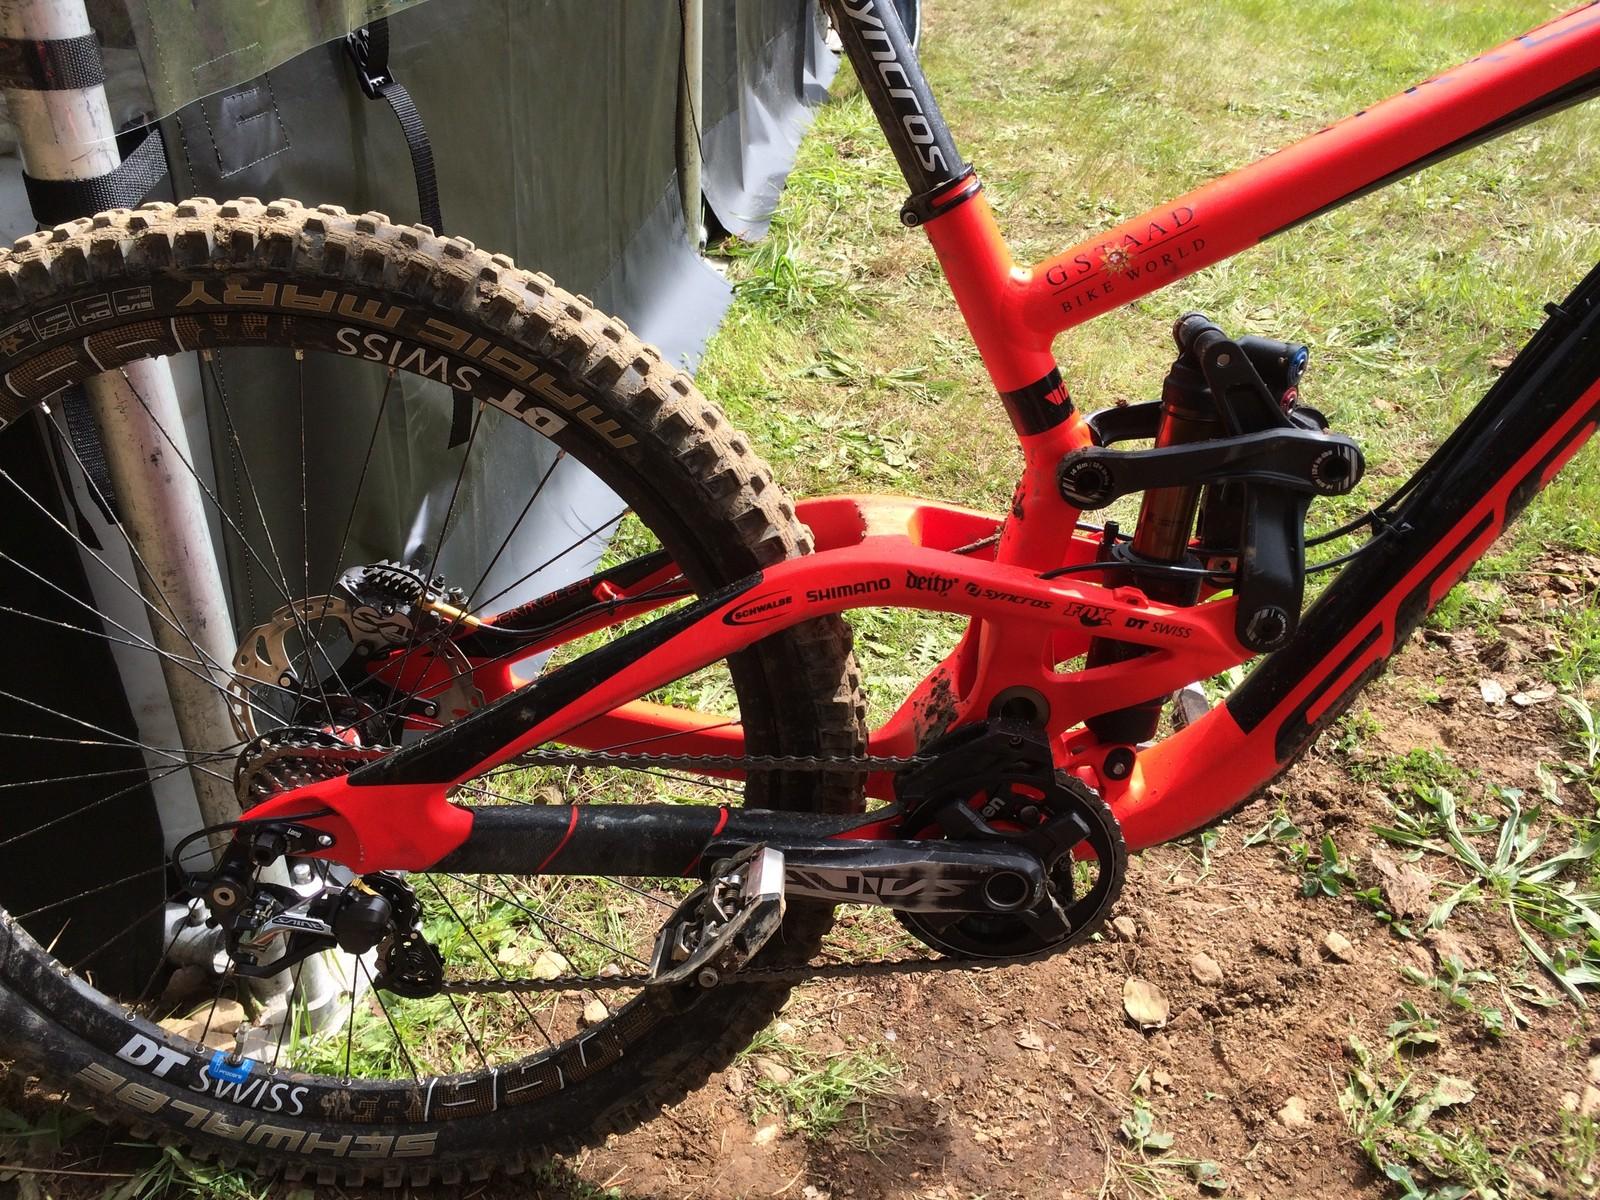 Neko Mulally's Scott Gambler - PIT BITS - Port Angeles ProGRT - Mountain Biking Pictures - Vital MTB